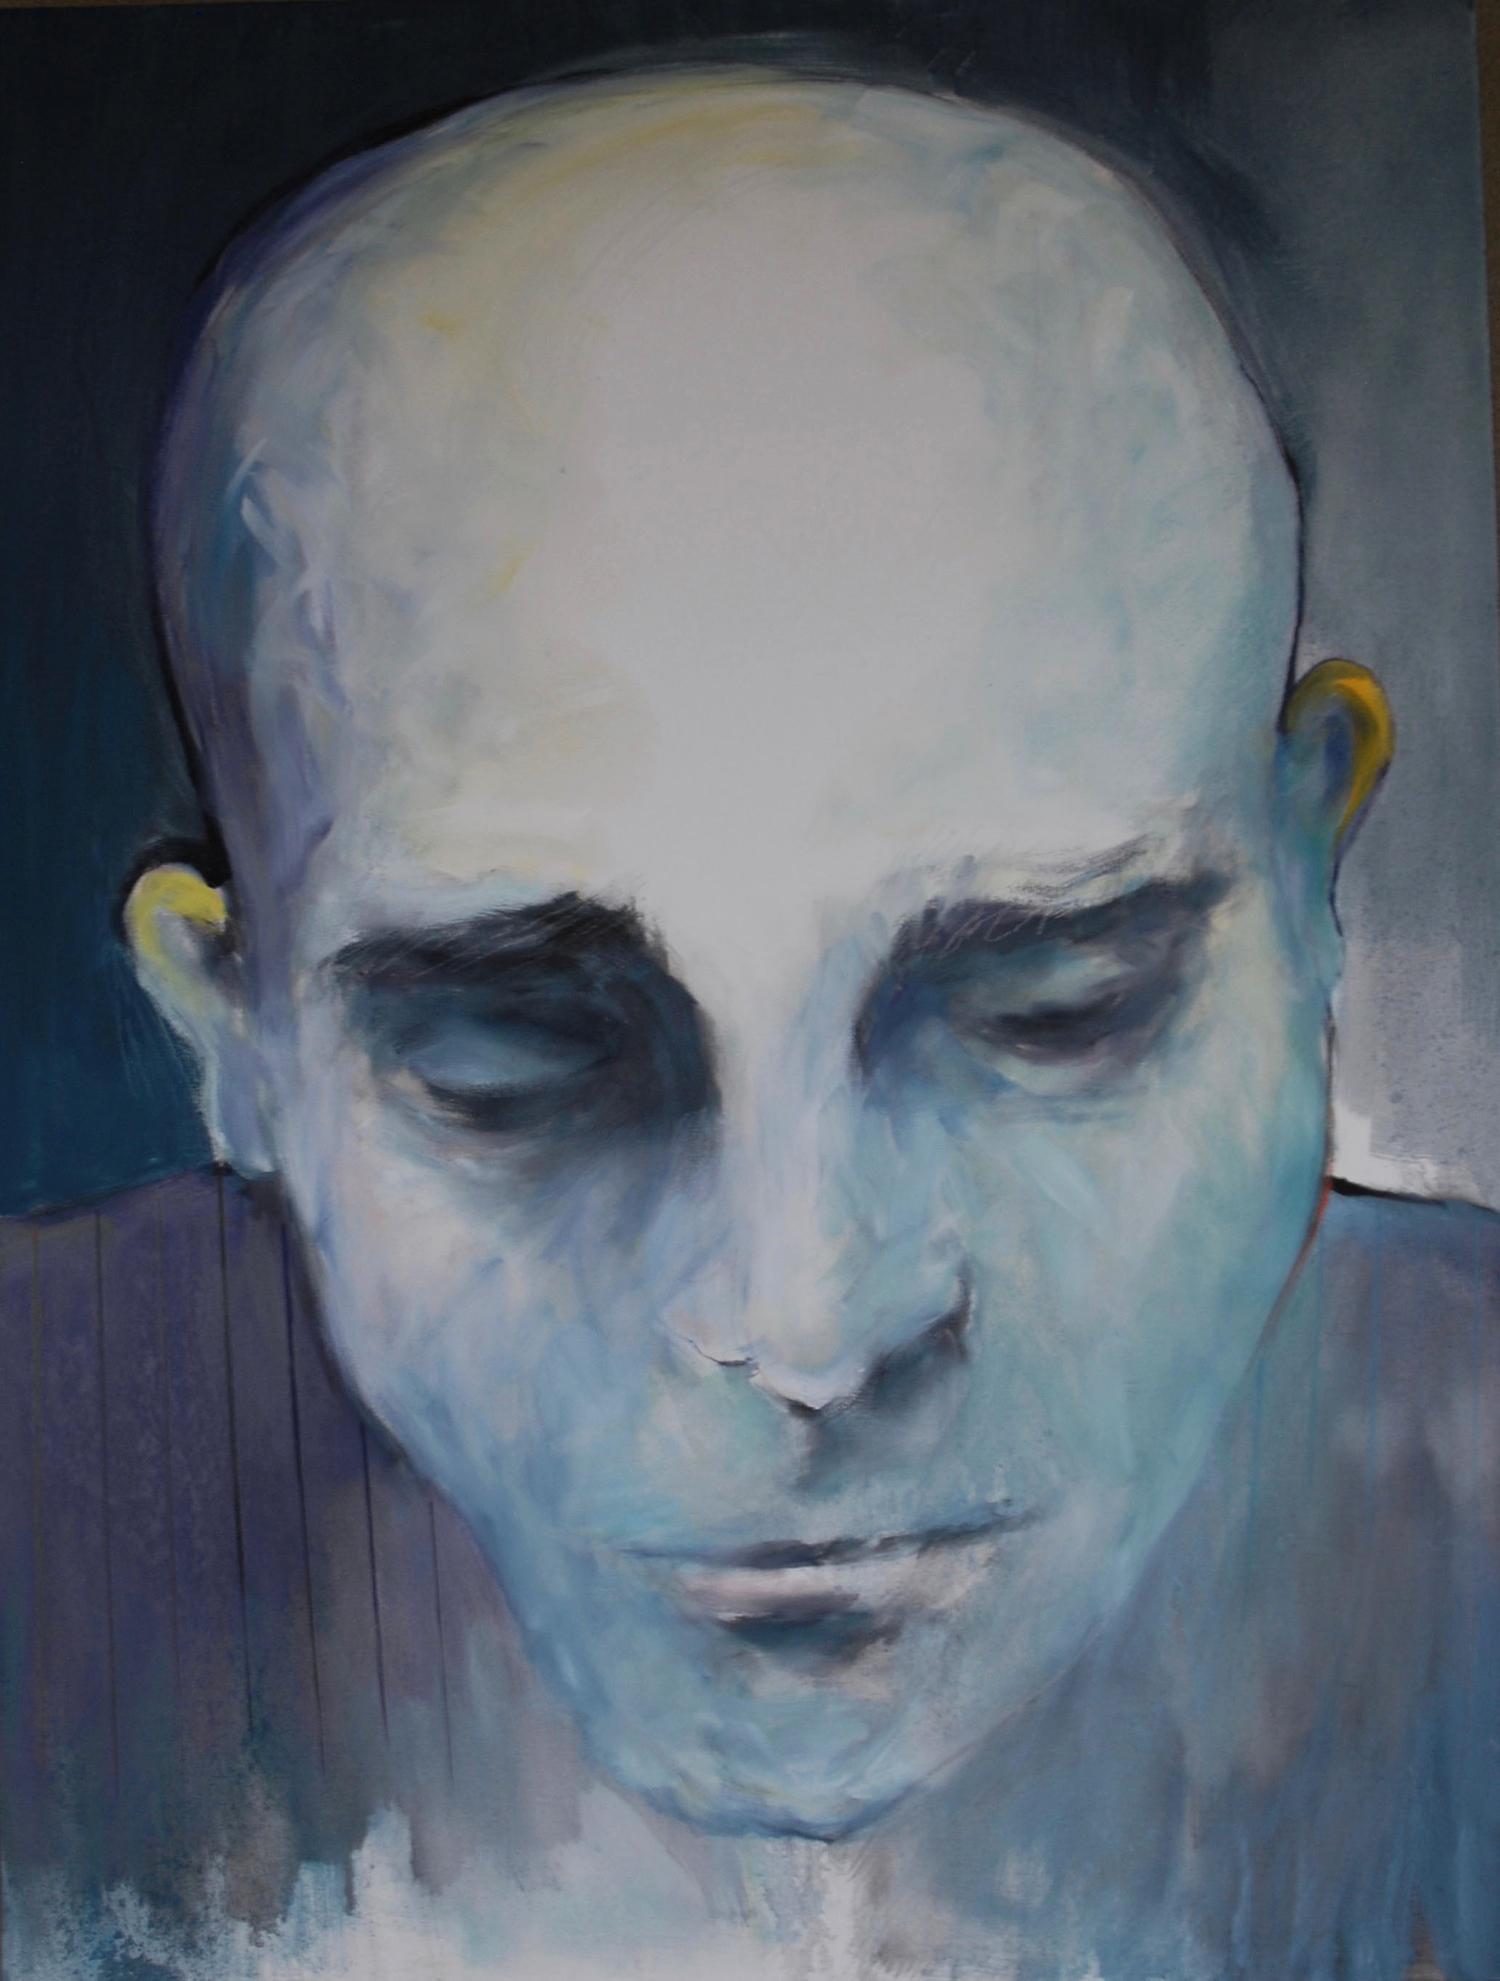 MAN IN A PINSTRIPED SHIRT